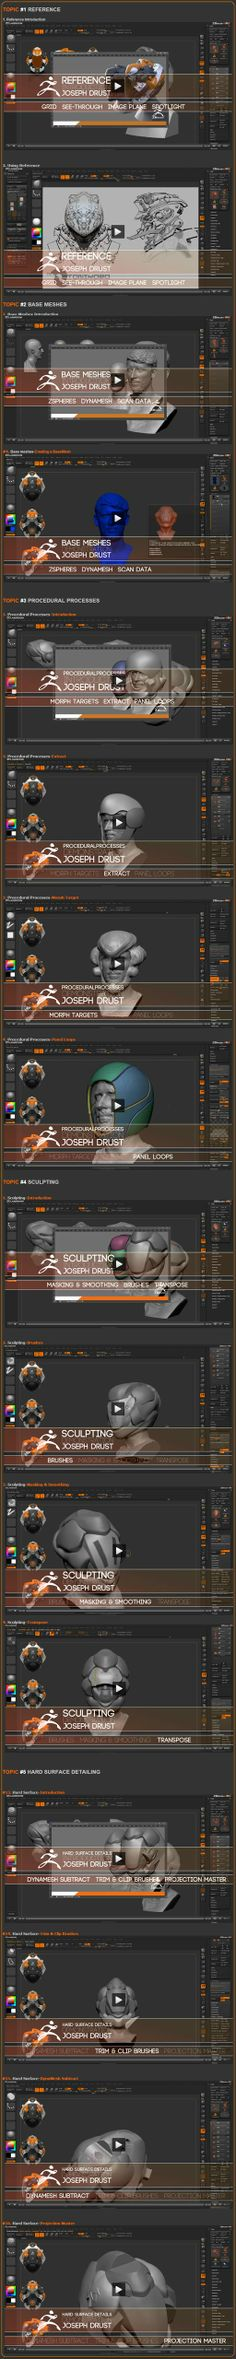 Helmet Creation in ZBrush